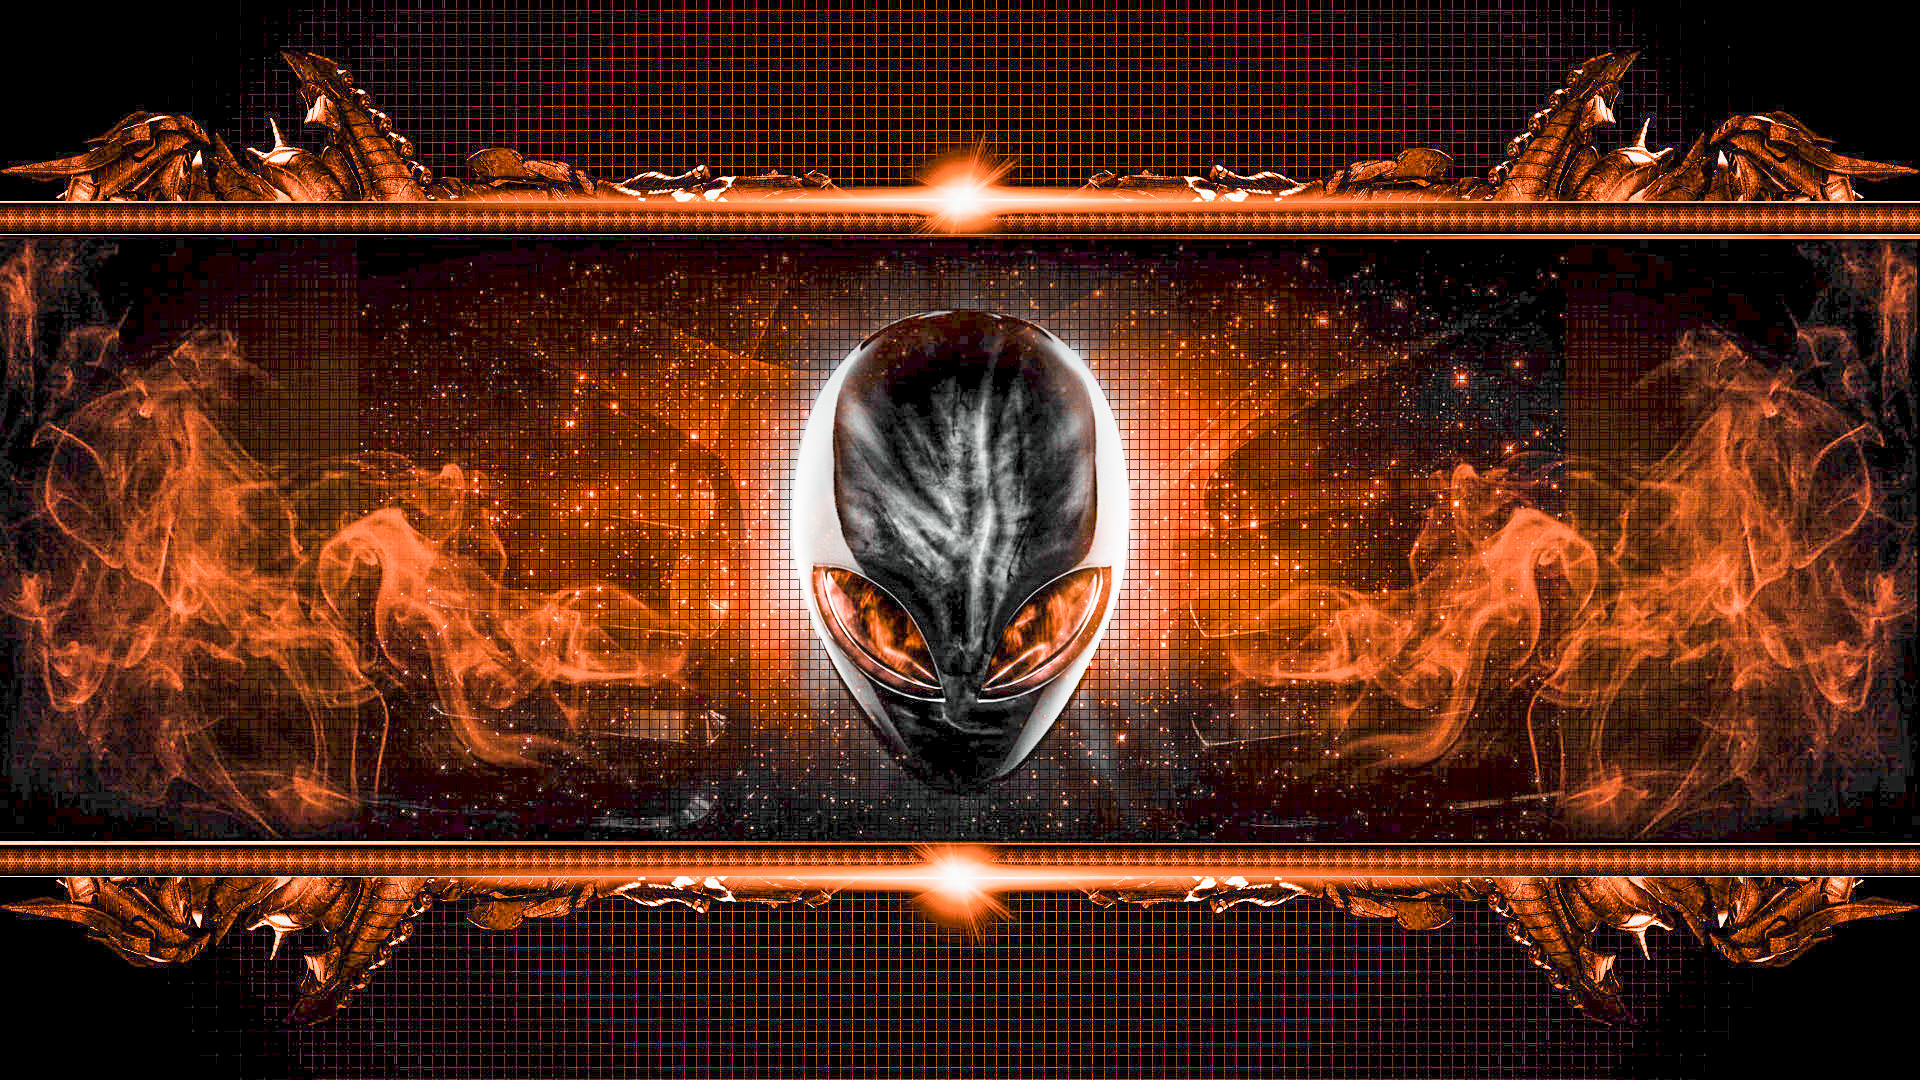 1920x1080 Alienware Wallpapers: Alienware On Gadget ~ celwall.com Technology Wallpapers Inspiration | alienware